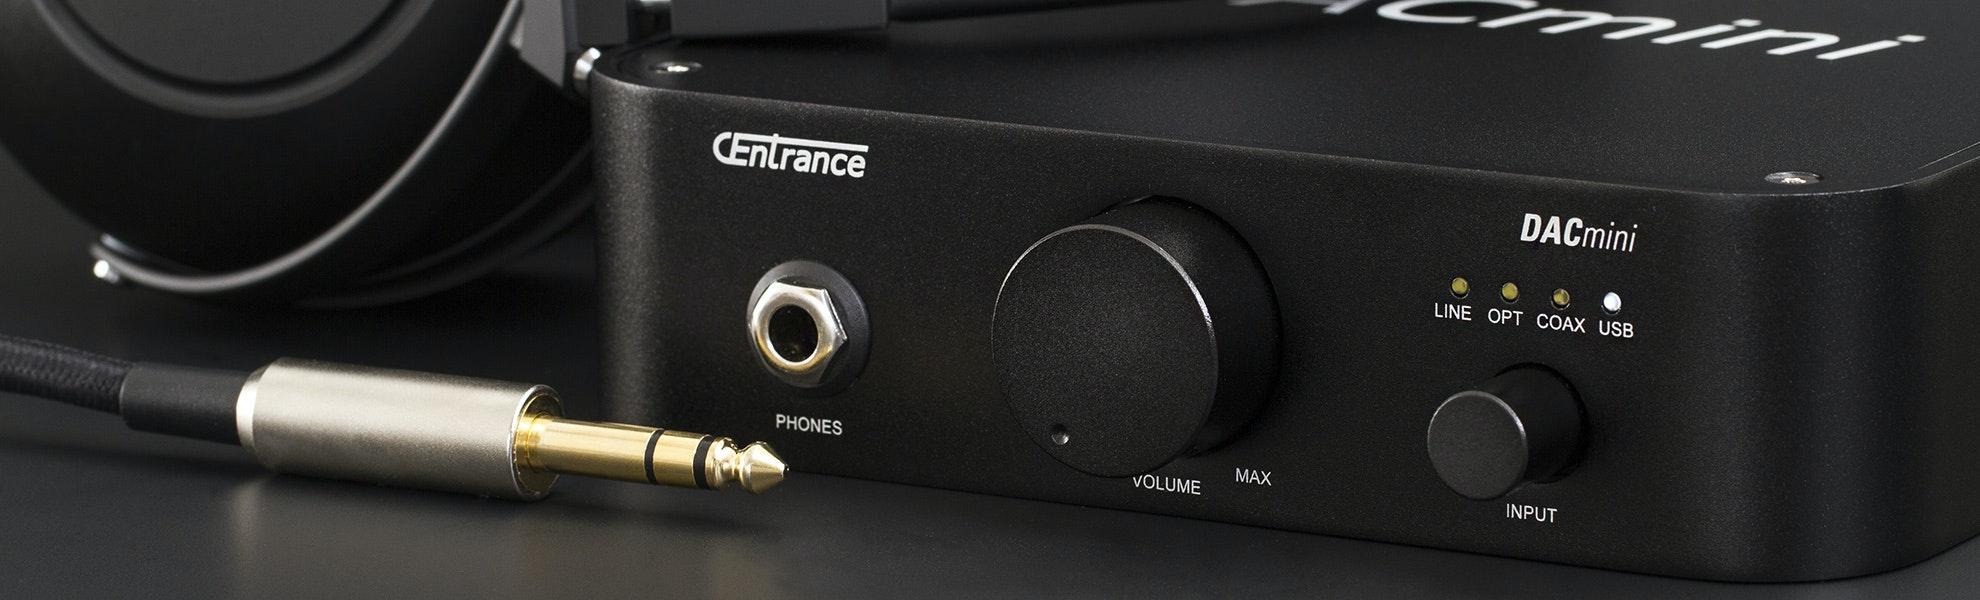 CEntrance DACmini PX Integrated Amp/DAC